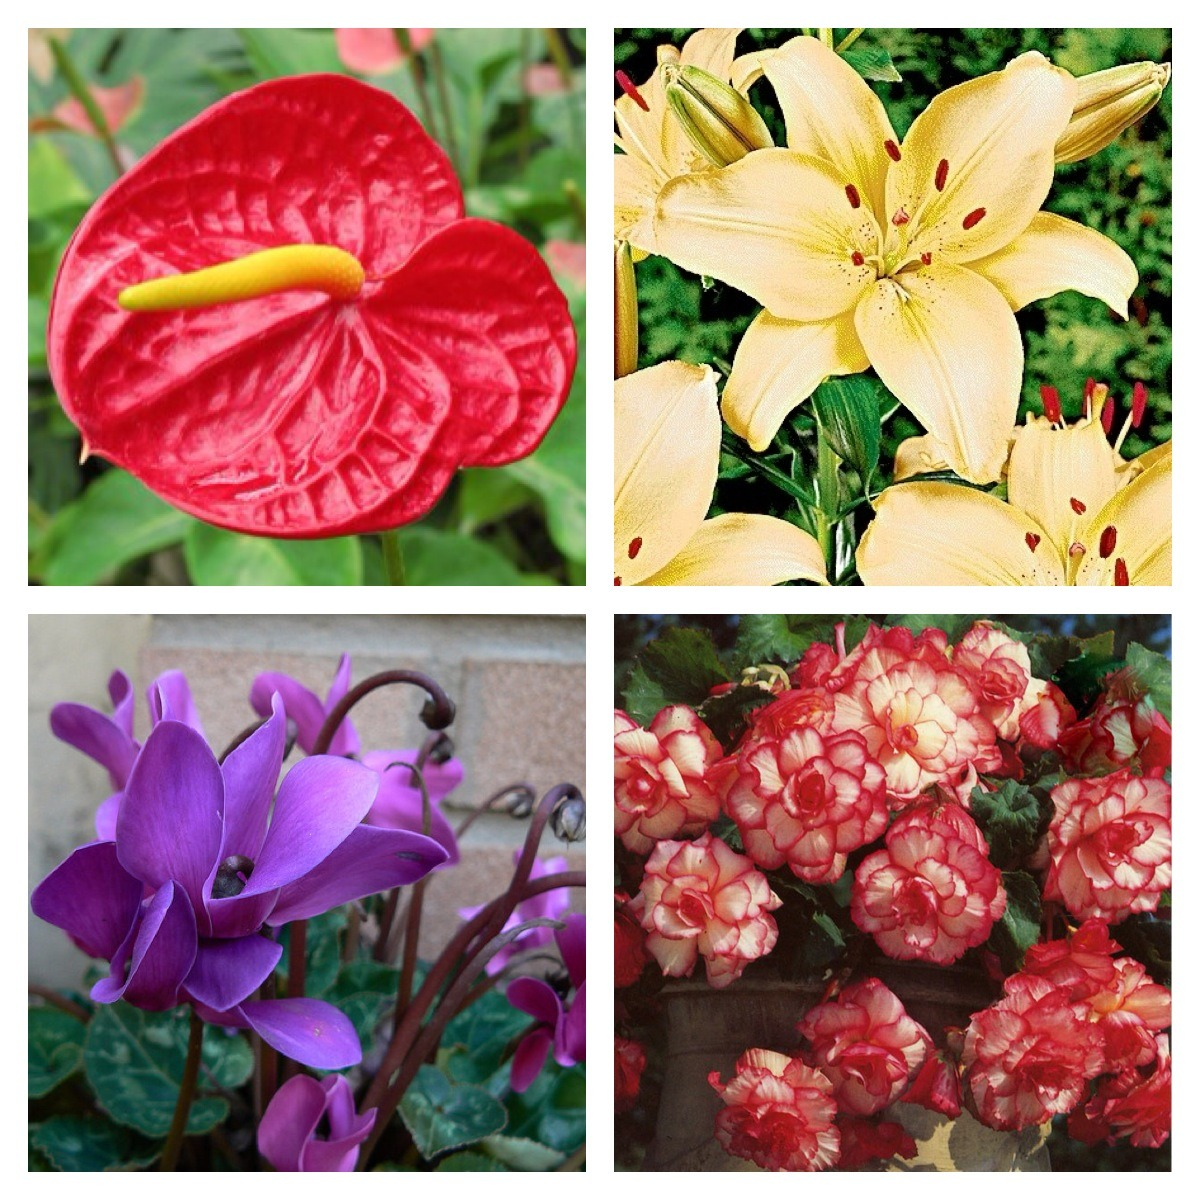 Ikea sedia giardino con piante da giardino ornamentali for Piante ornamentali da giardino prezzi